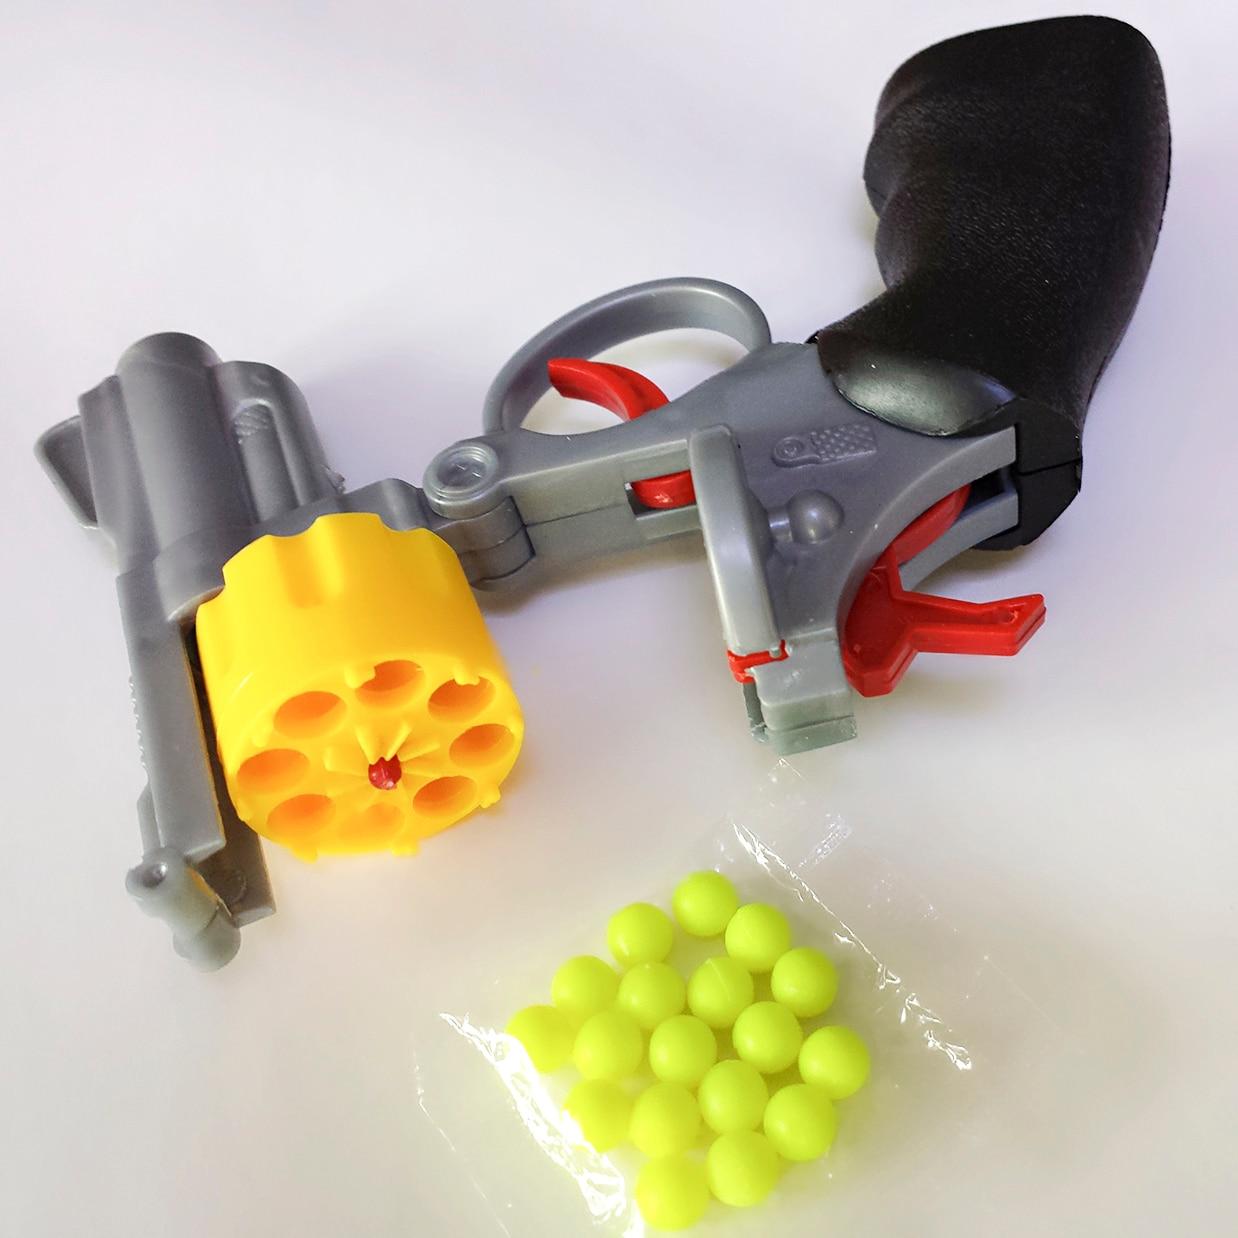 Toy Gun Soft Bullet Plasic Gun Toy for Kids Nerf Pistol Nerf Bullets Sniper  Rifle Free Shipping BB CS Game Shooting Boys Toy